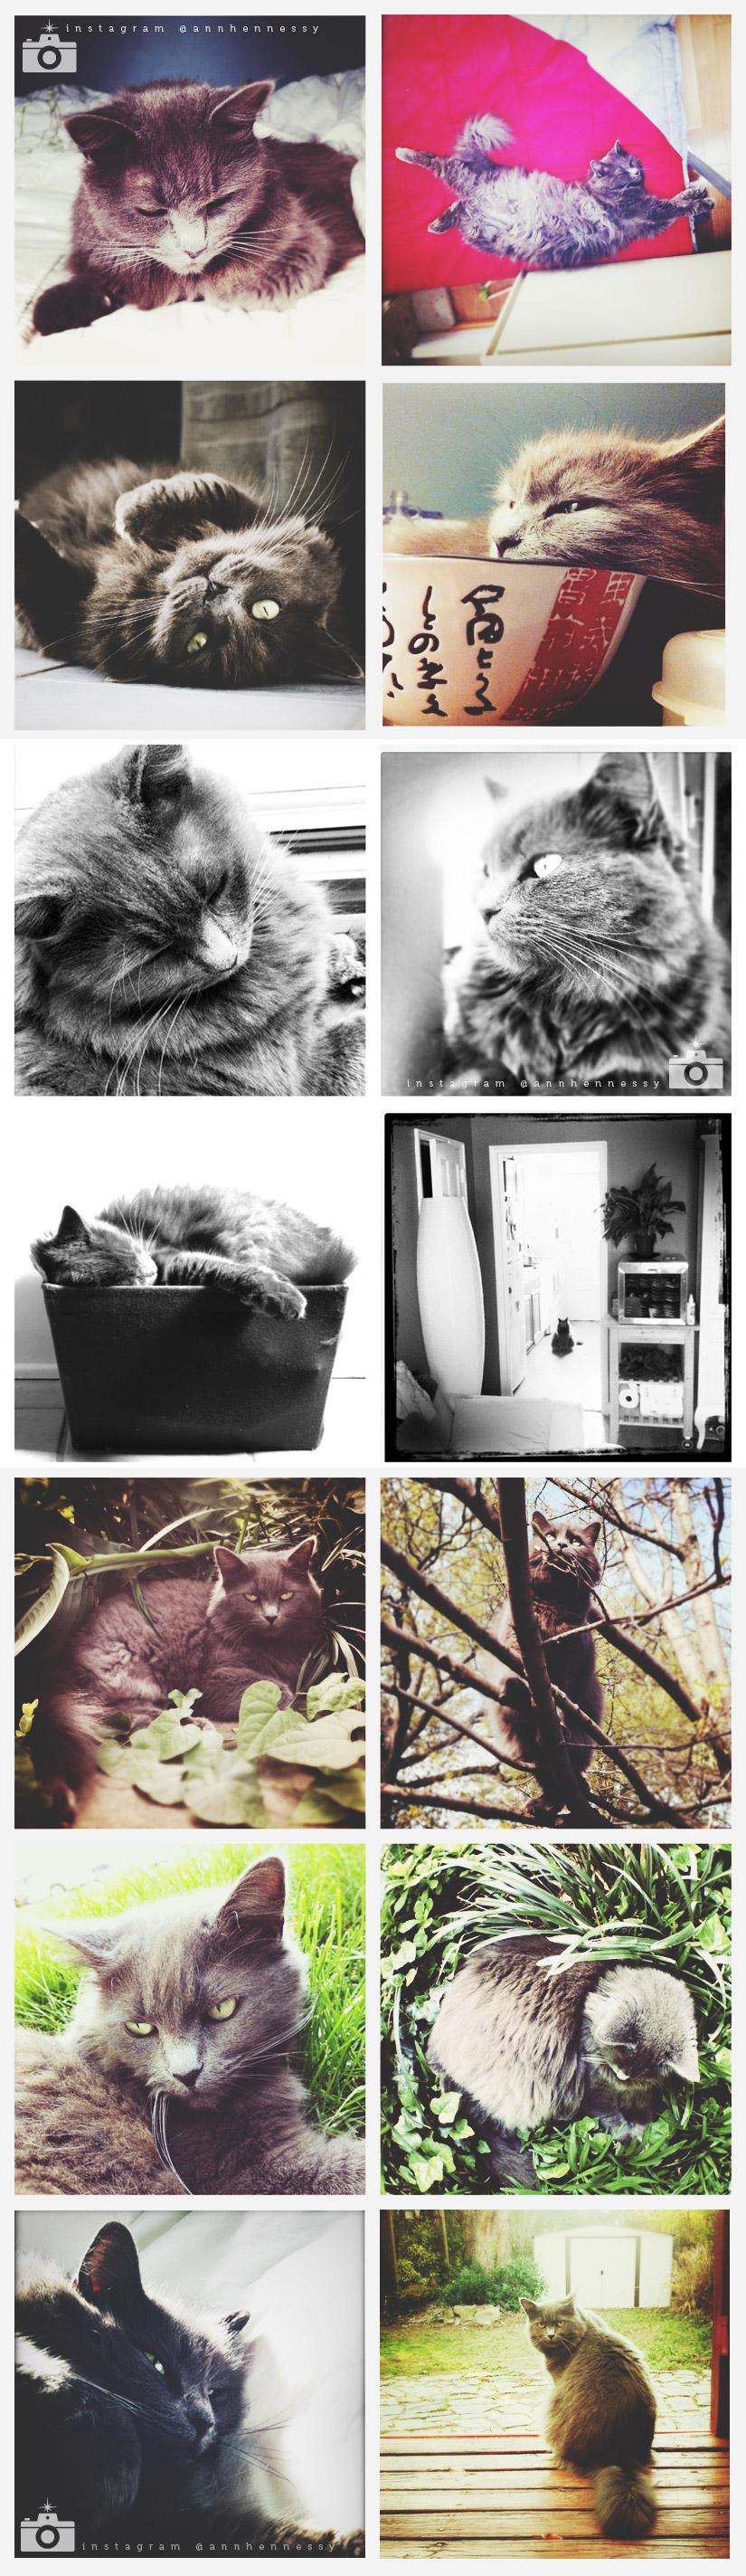 Macy_post3.jpg